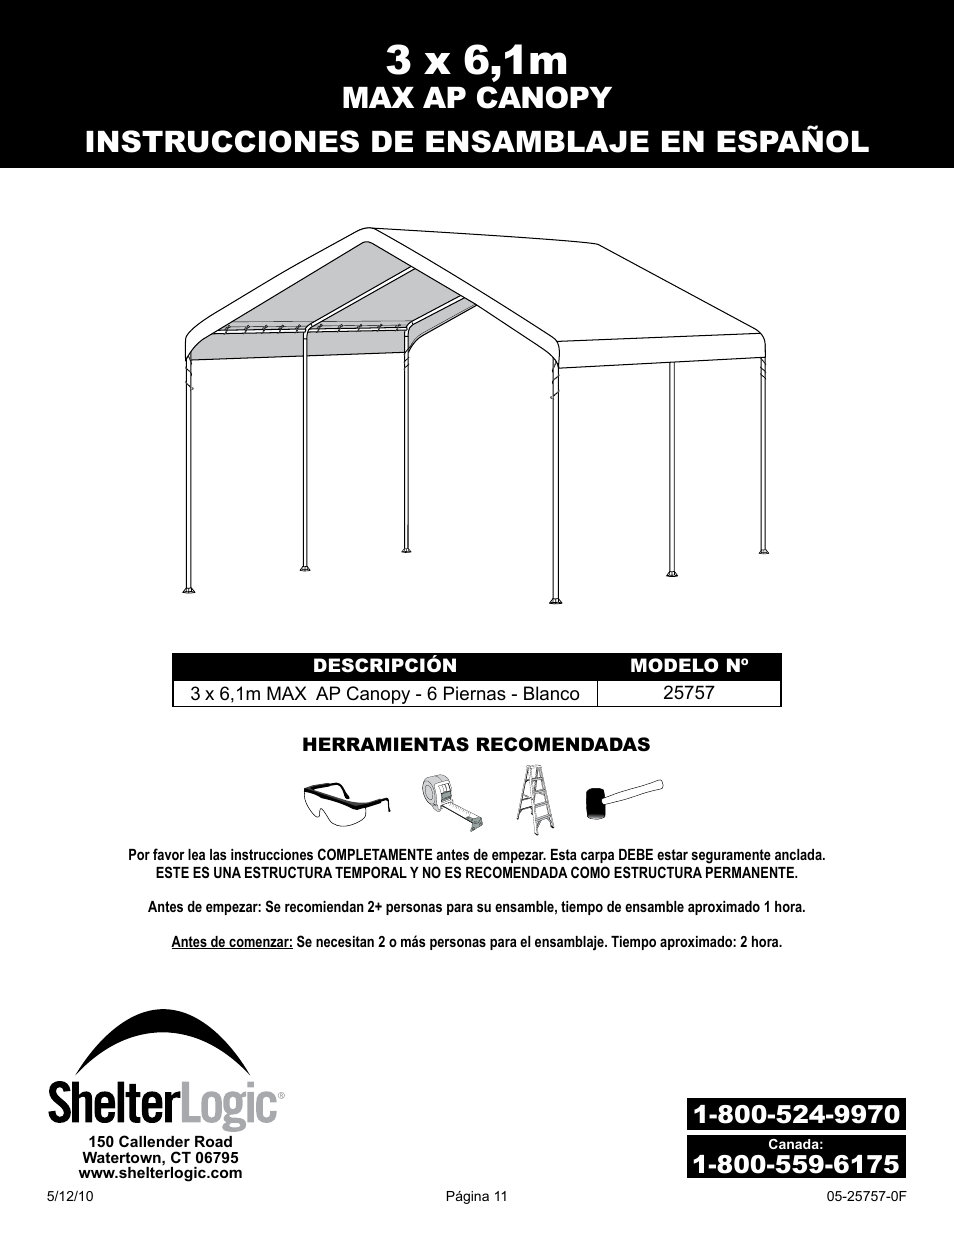 3 x 61m | ShelterLogic 25757 10 x 20 Max AP Canopy User Manual | Page 11 / 15  sc 1 st  manualsdir.com & 3 x 61m | ShelterLogic 25757 10 x 20 Max AP Canopy User Manual ...